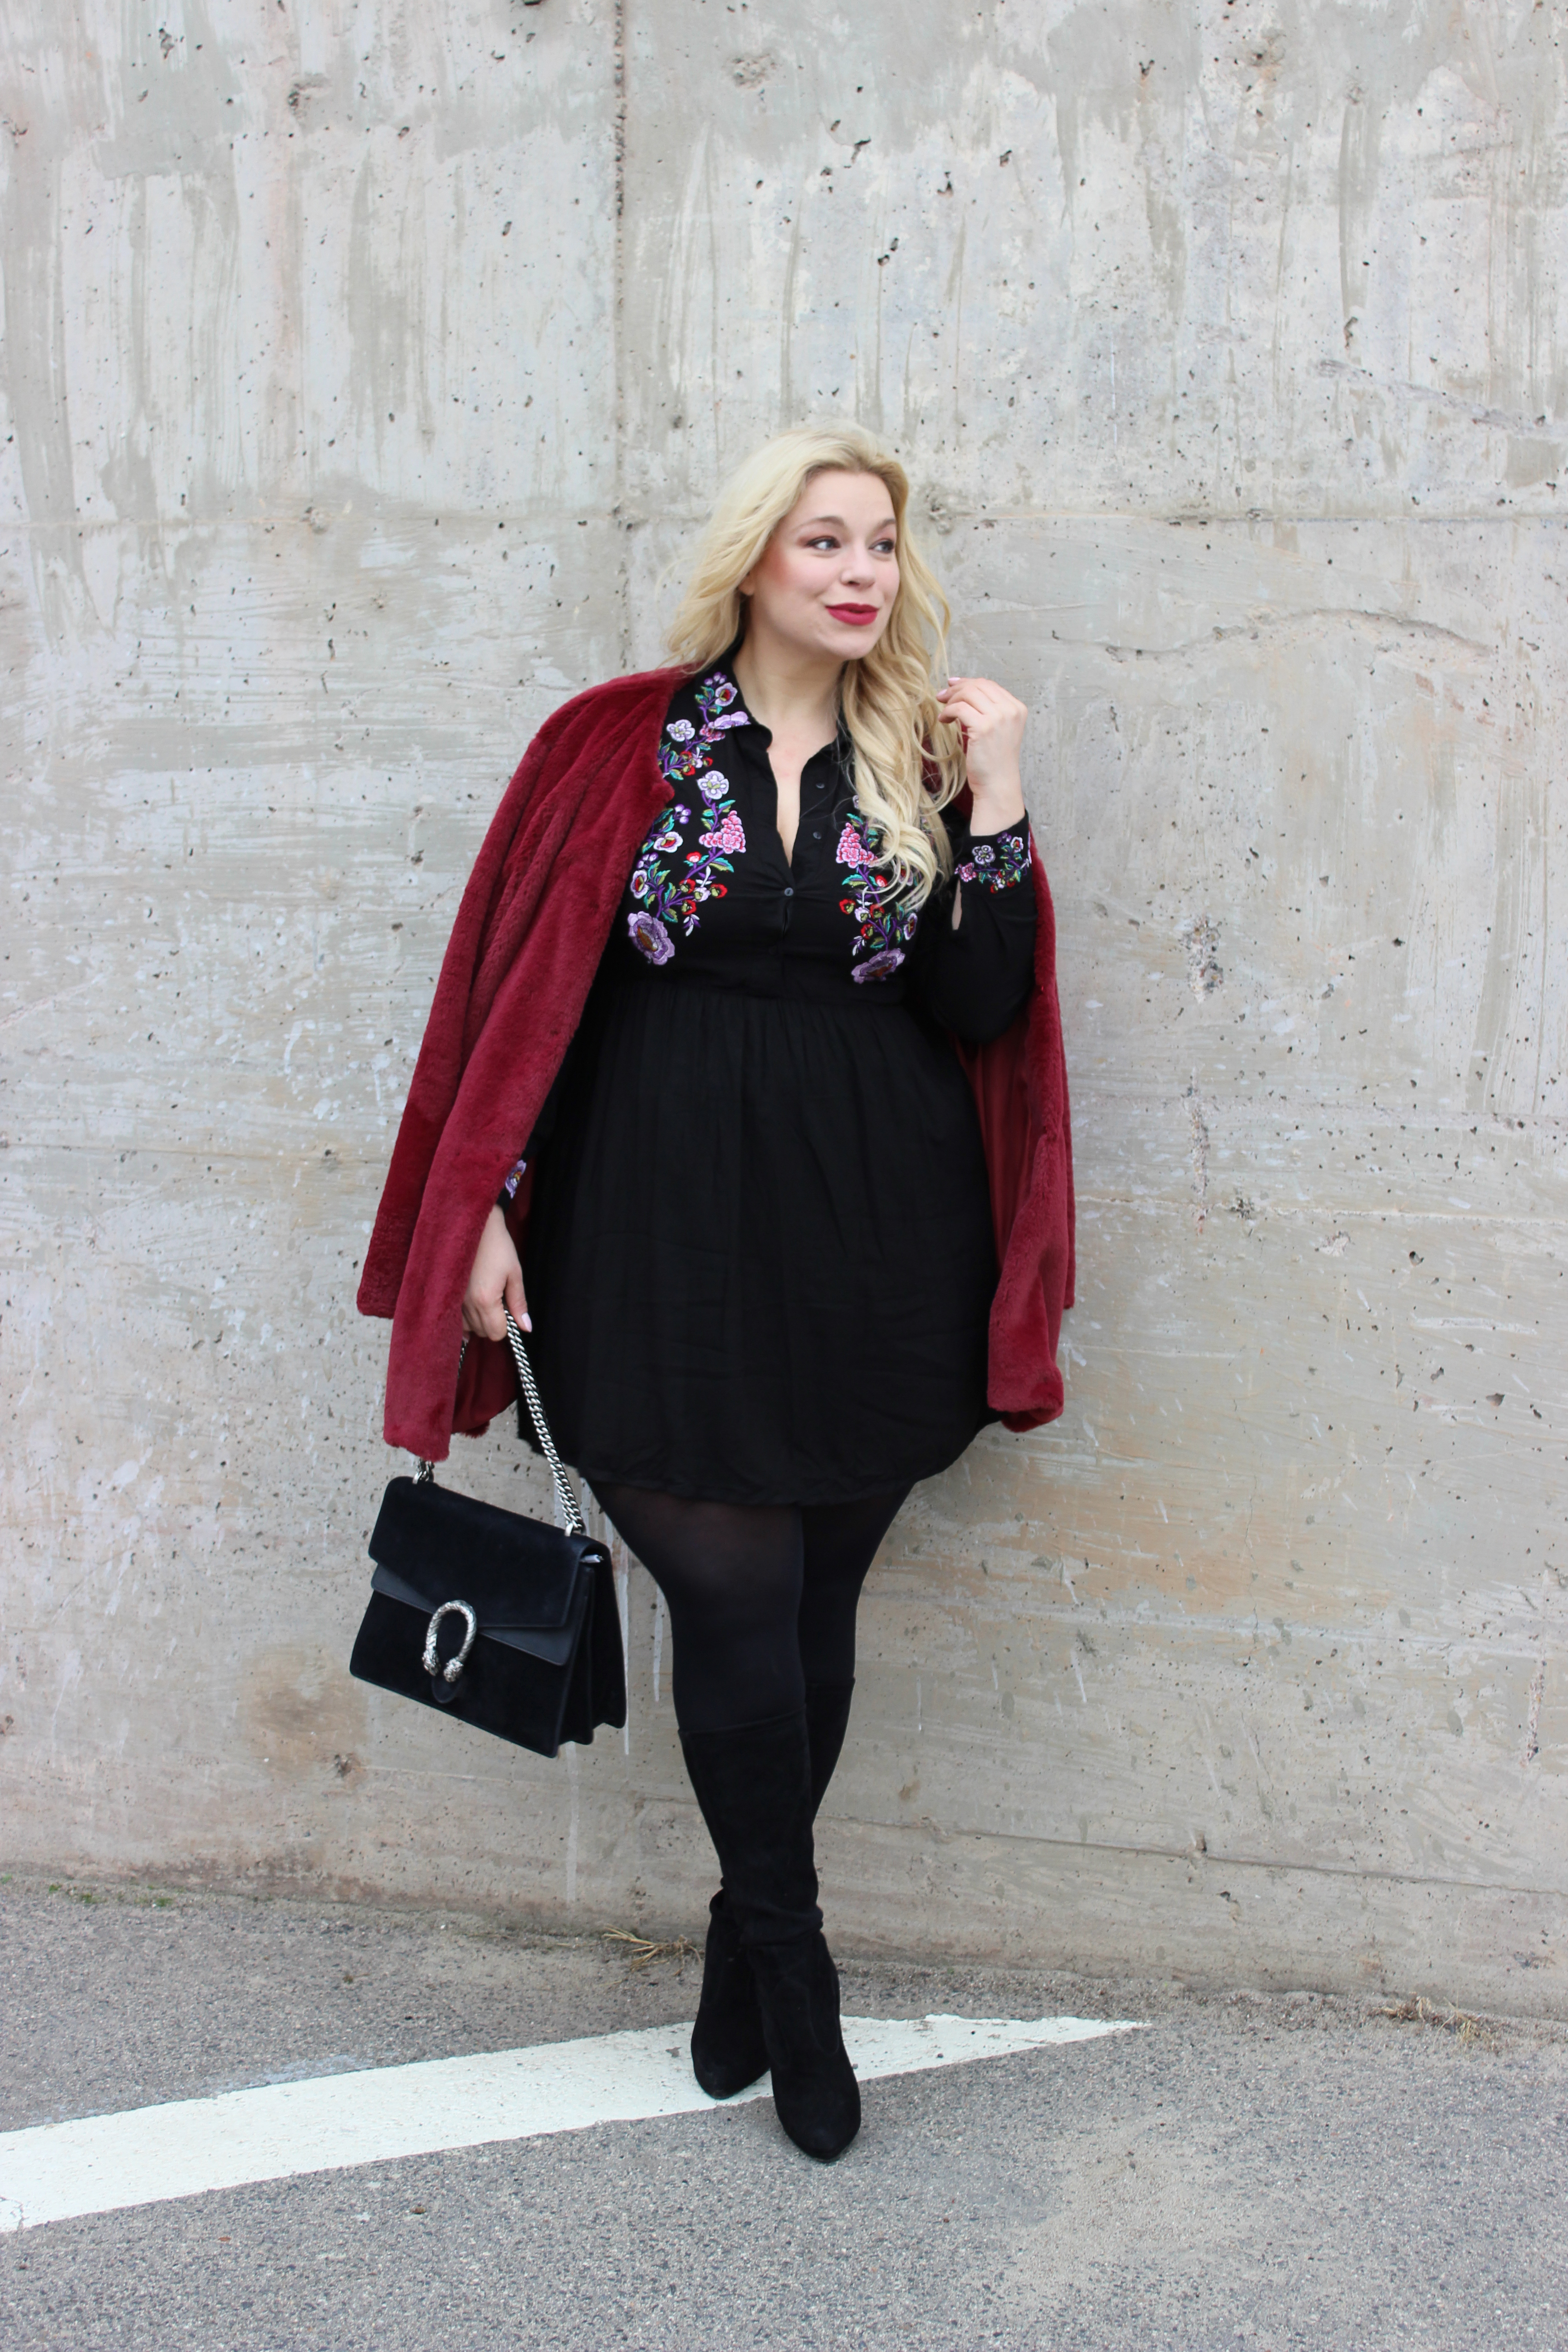 caterina-pogorzelski-wundercurves-Plussize-gucci-Blogger